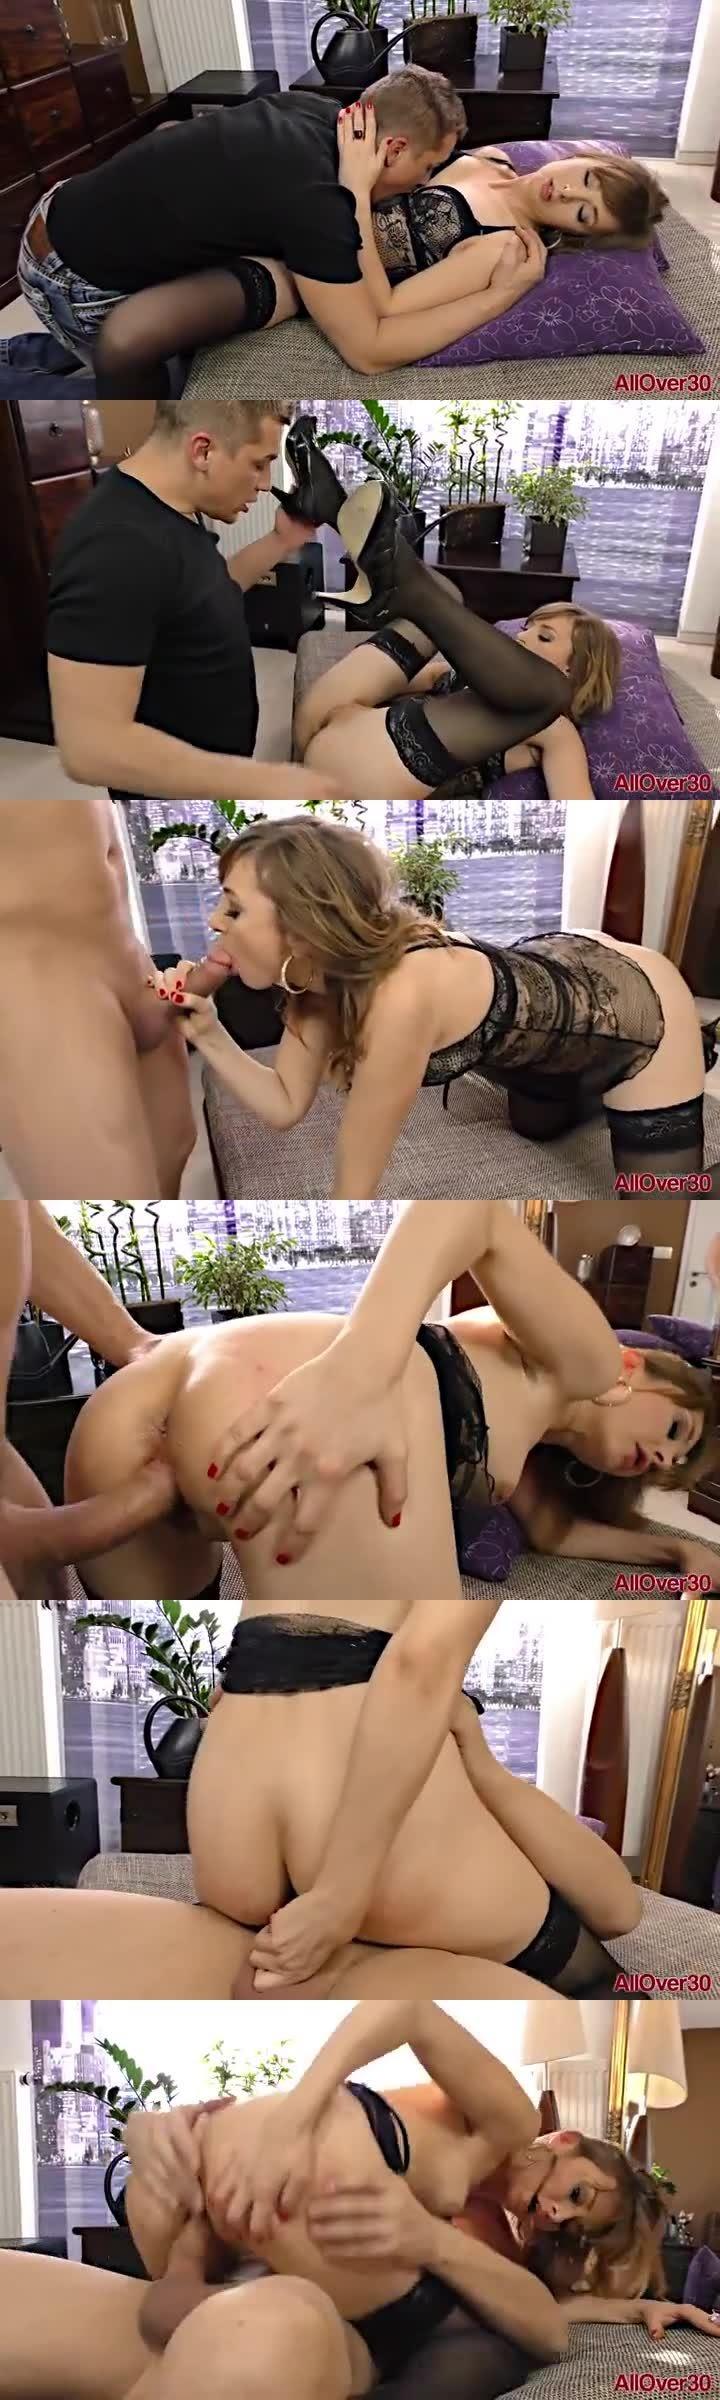 Luca Bella Ladies In Action